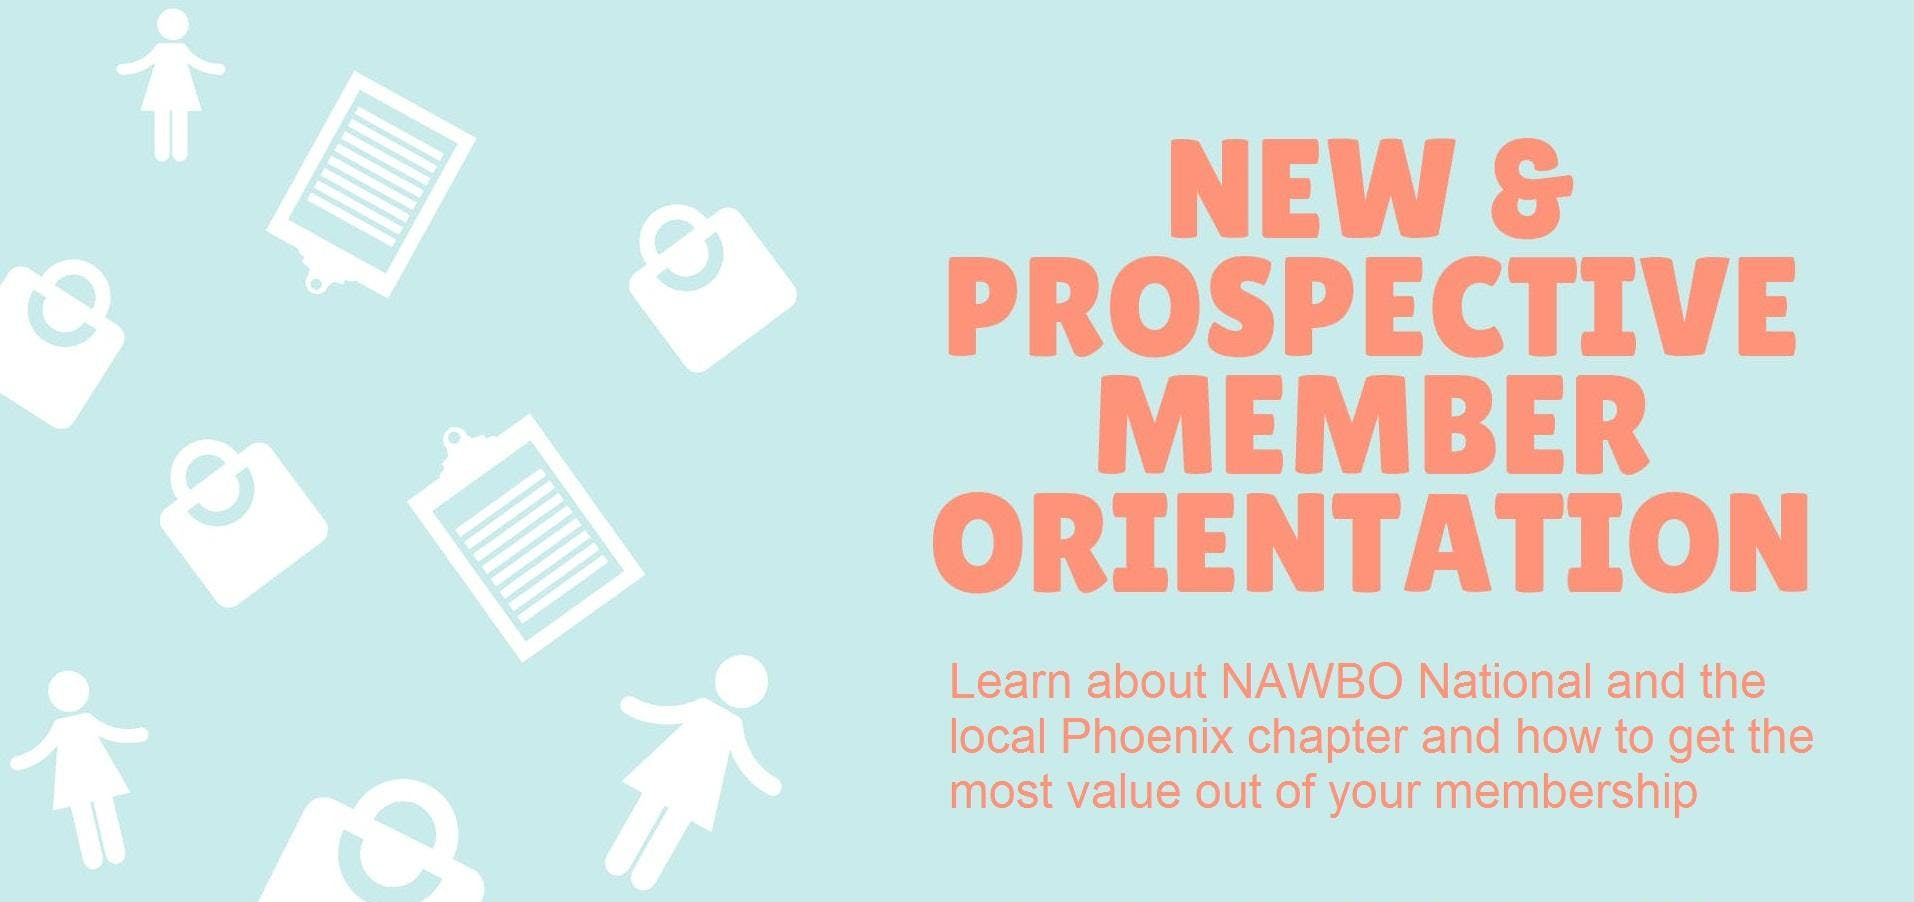 NAWBO New Member Orientation